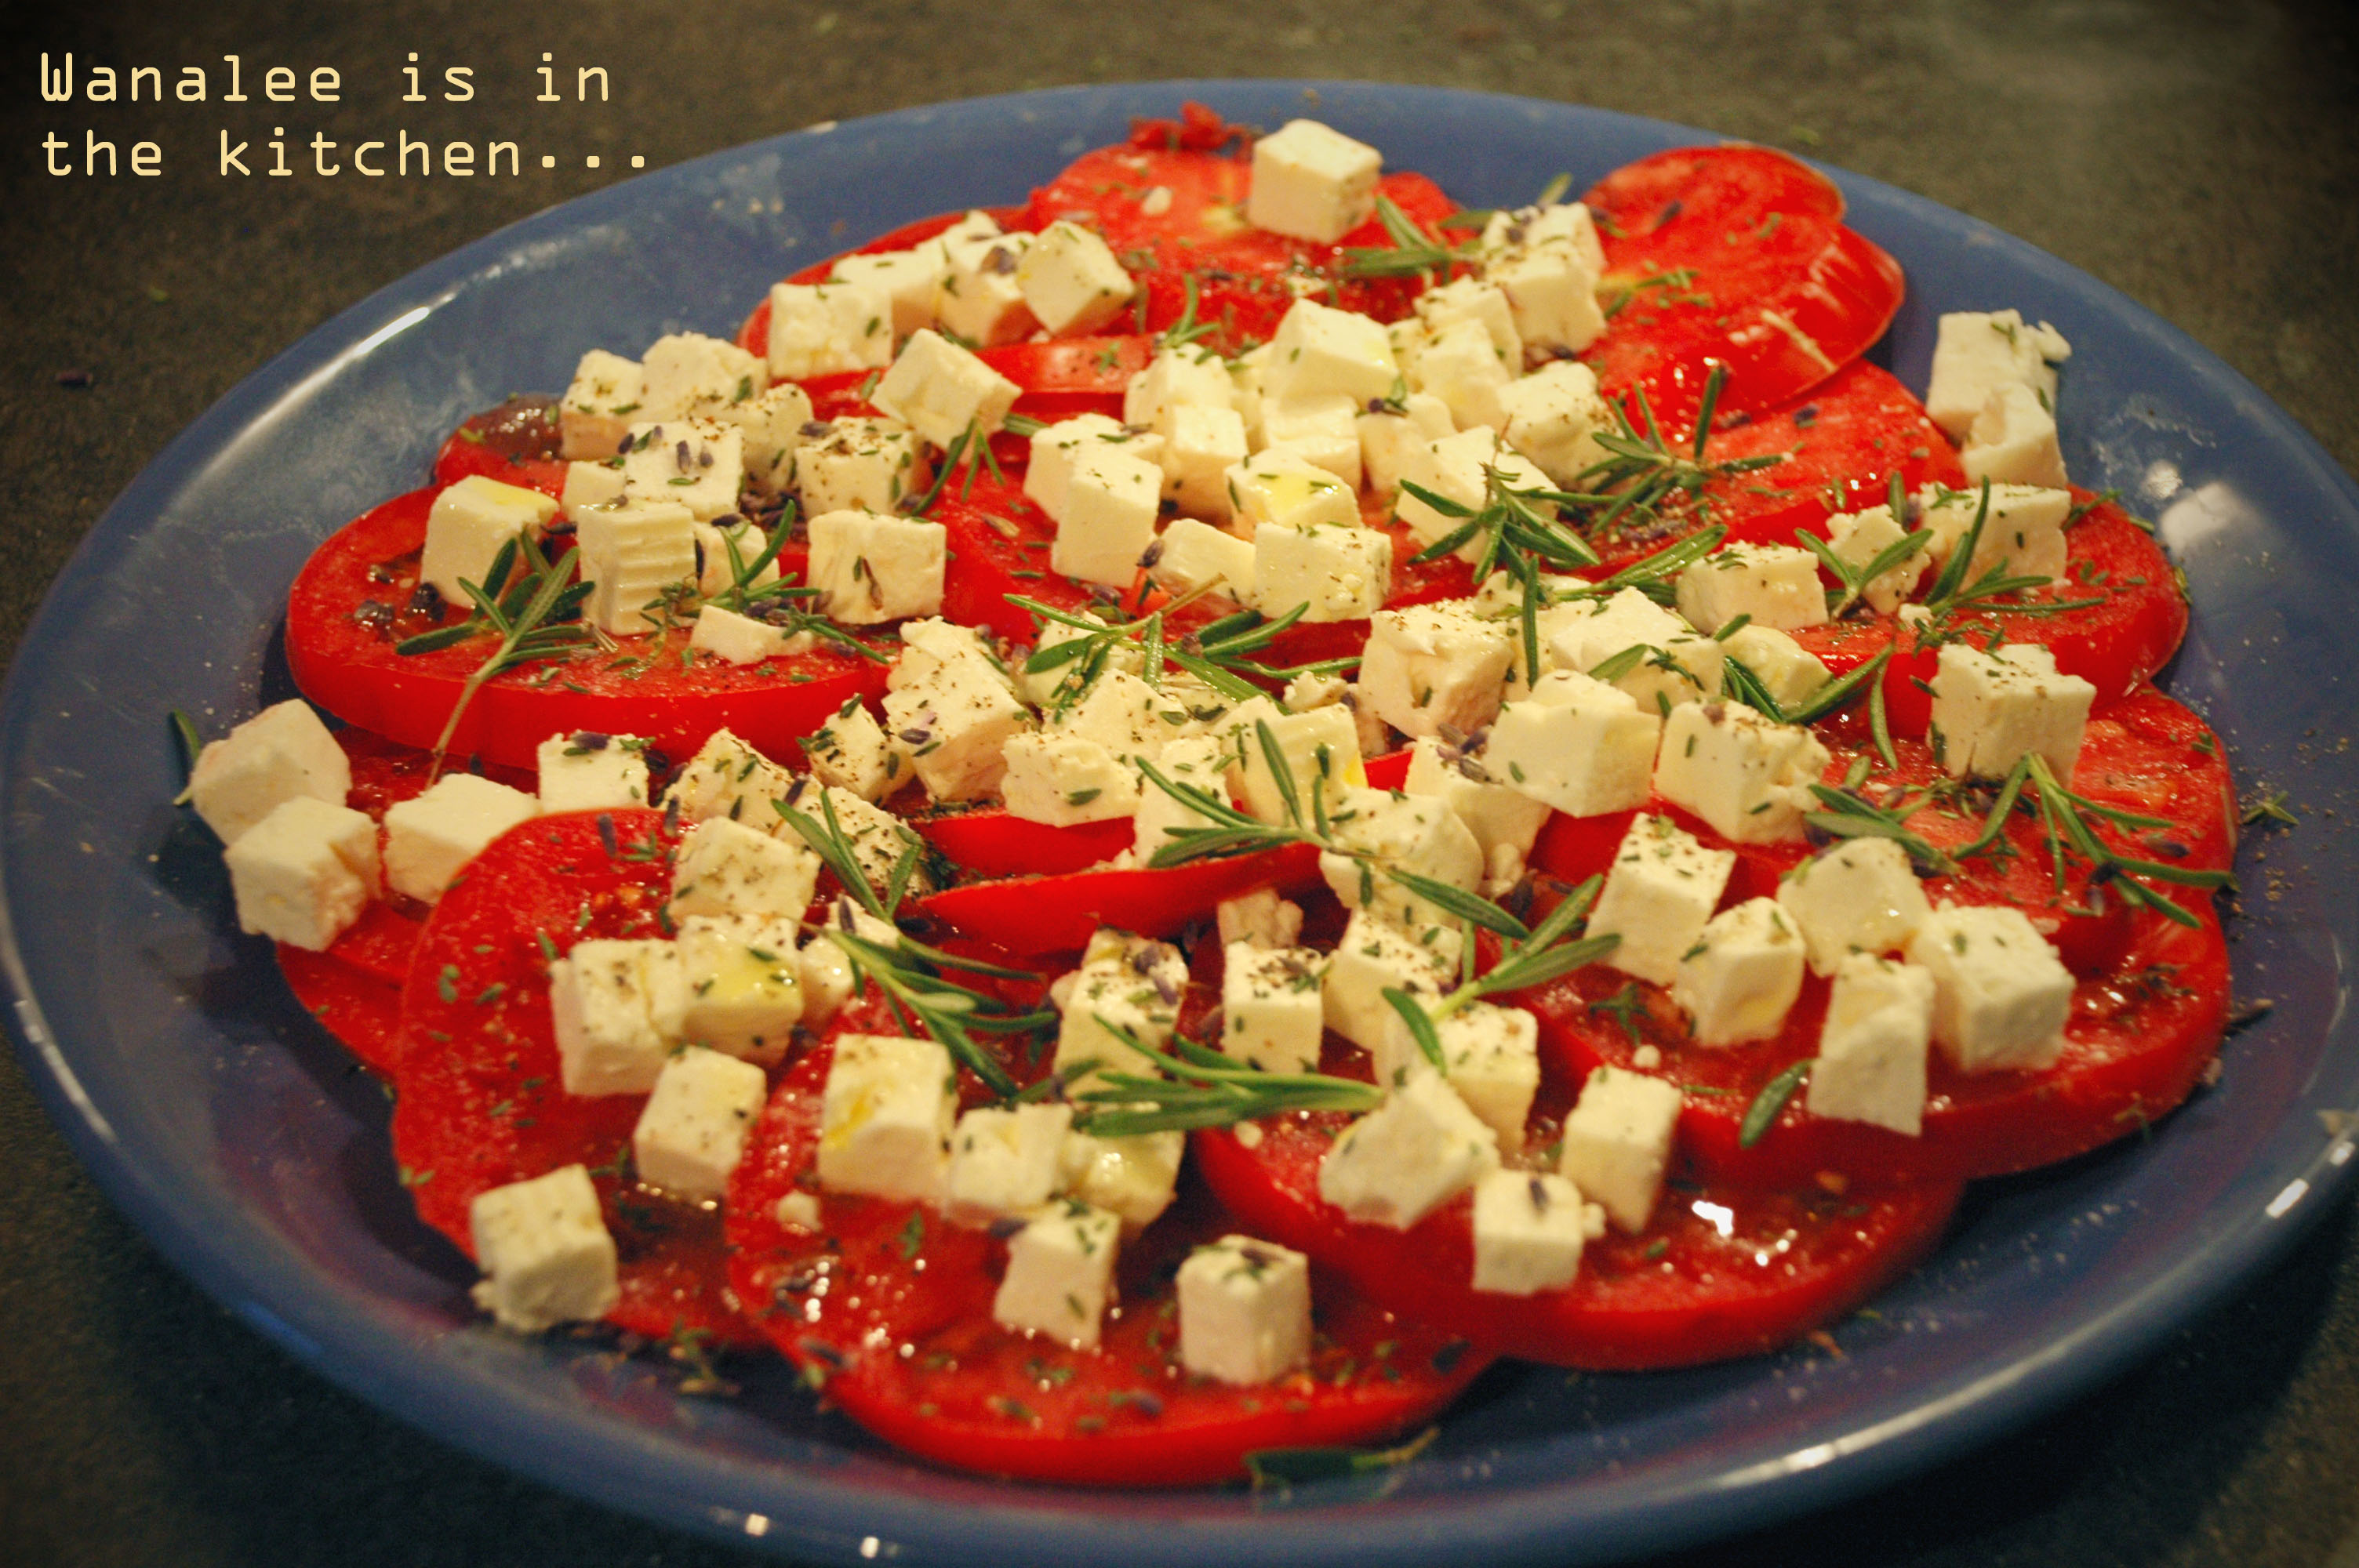 salade de tomates la m diterran enne wanalee cuisine. Black Bedroom Furniture Sets. Home Design Ideas